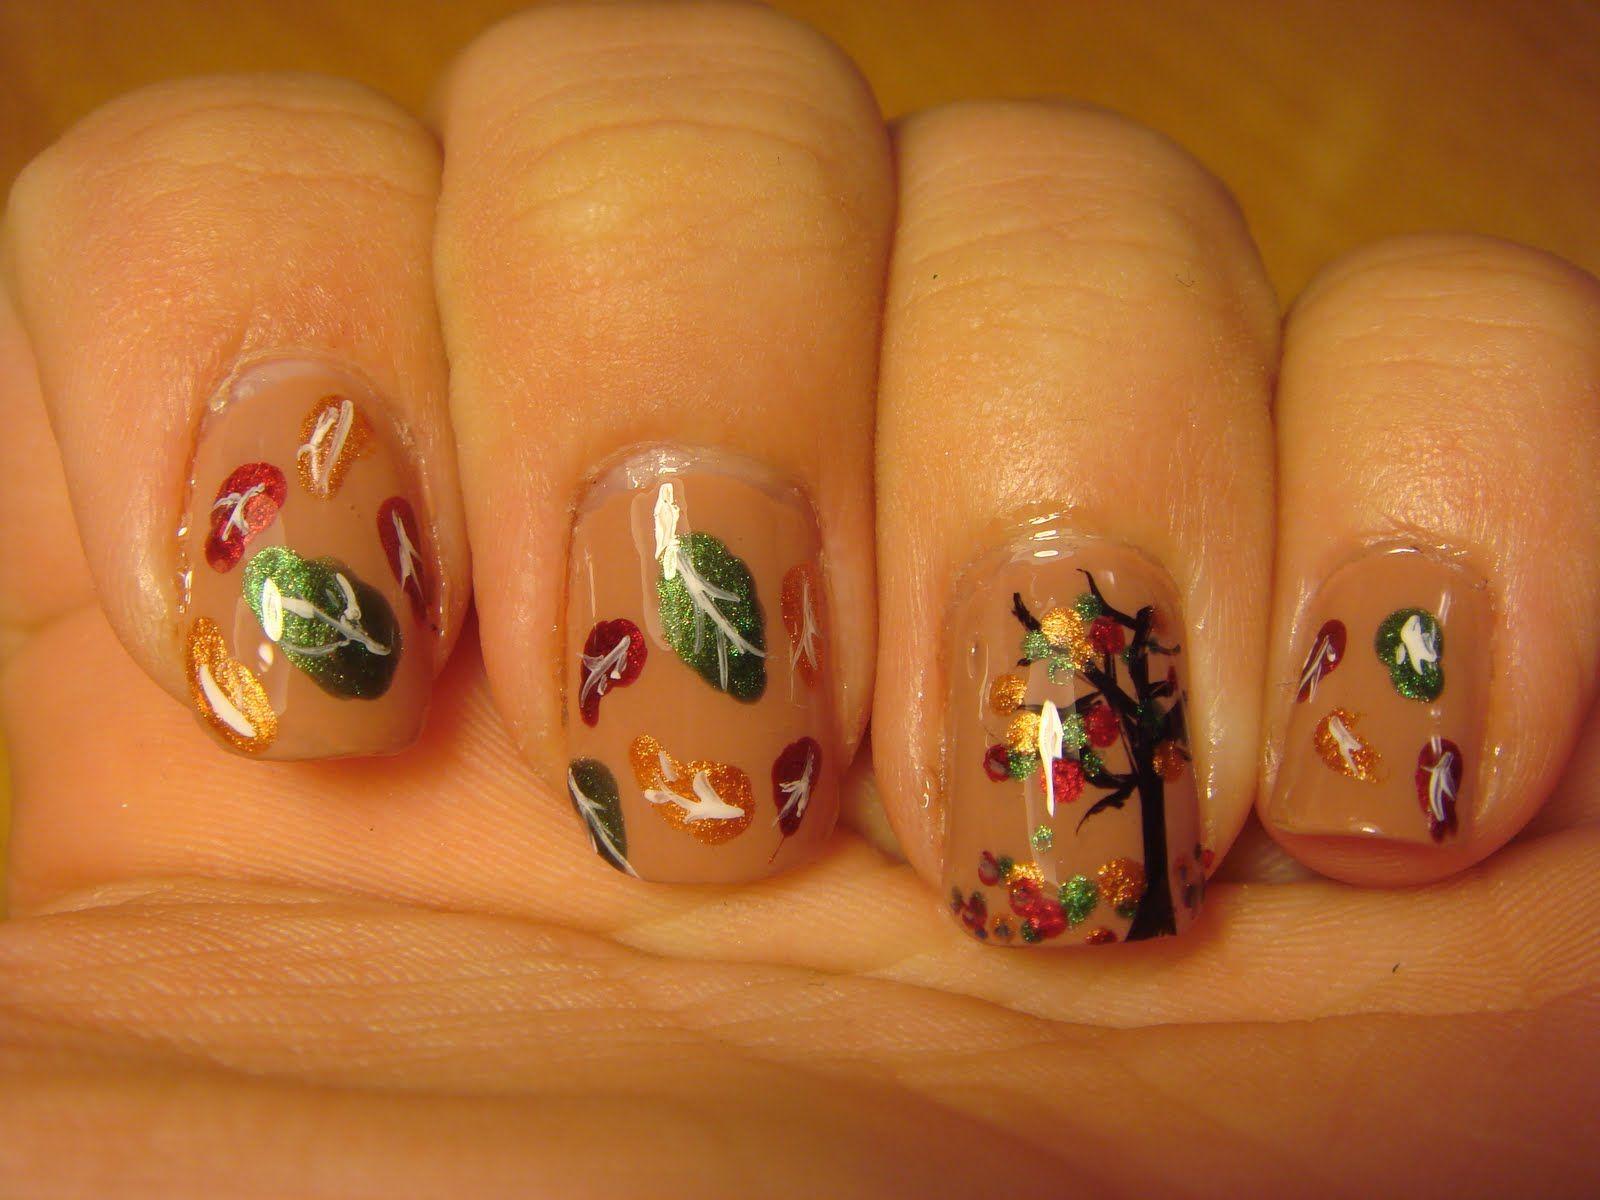 fall nail art | FALLING LEAVES NAIL ART DESIGN | Nail Art Designs ...